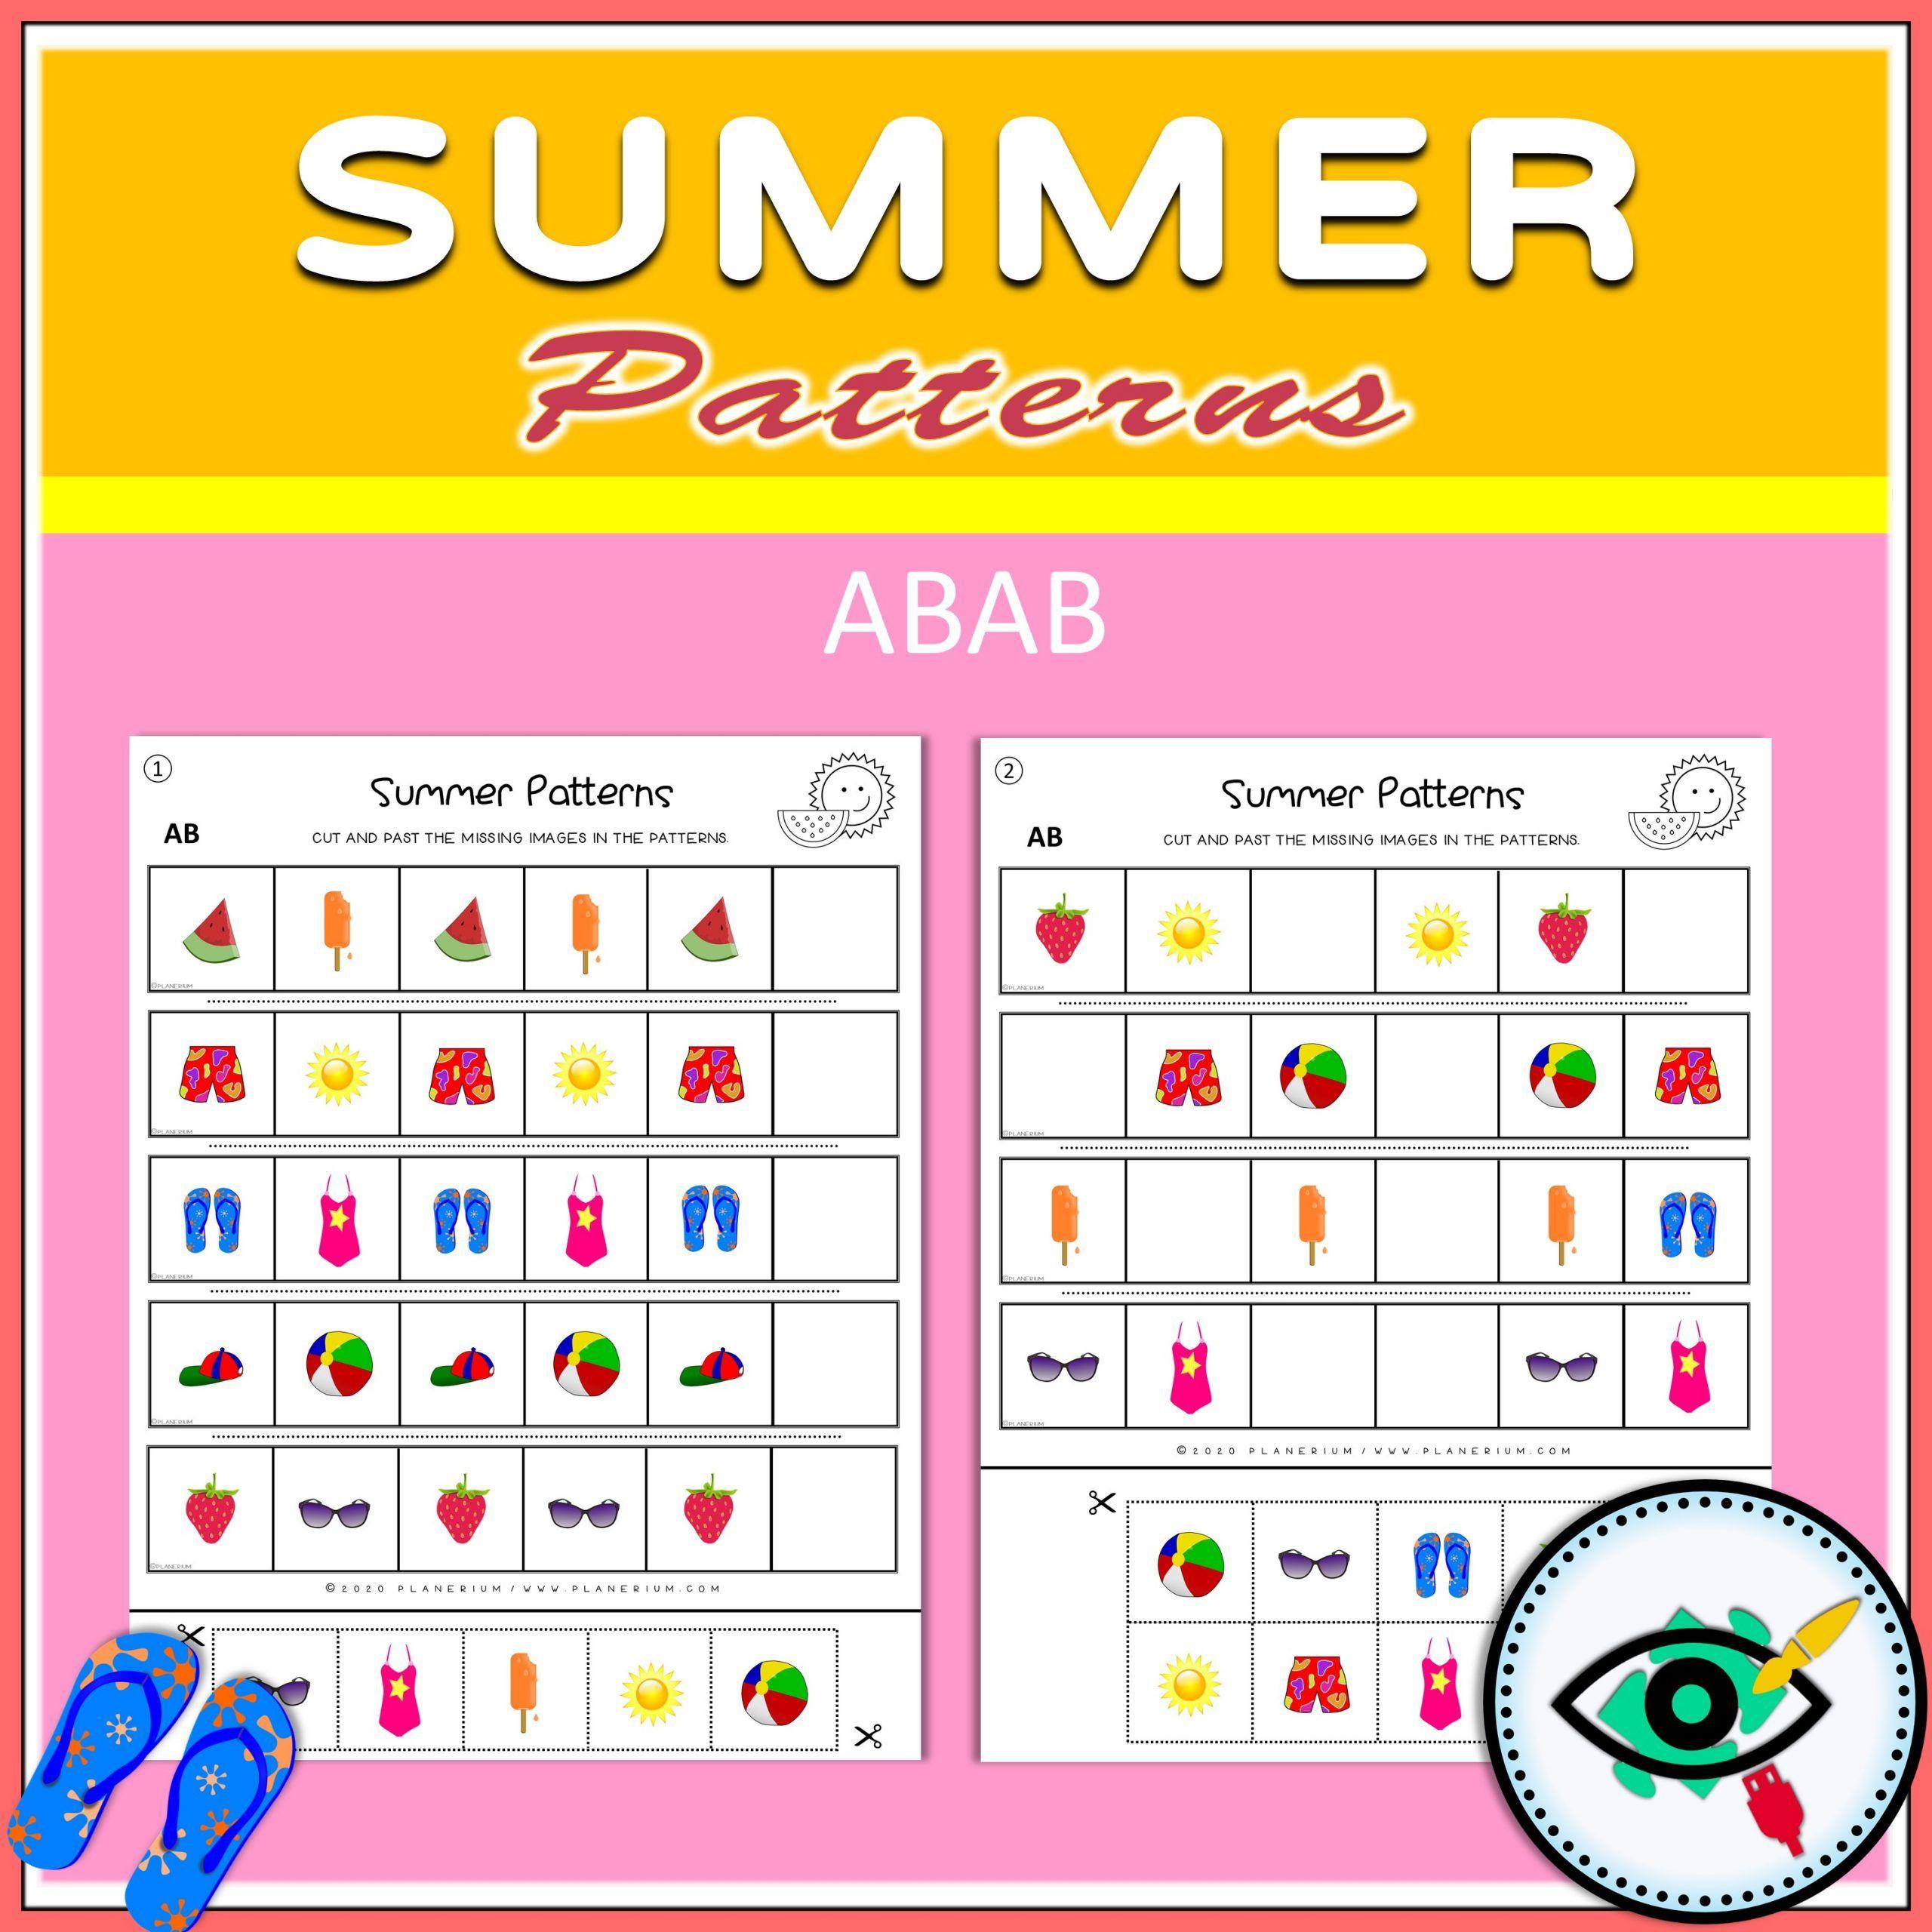 Summer - Patterns - Title 2